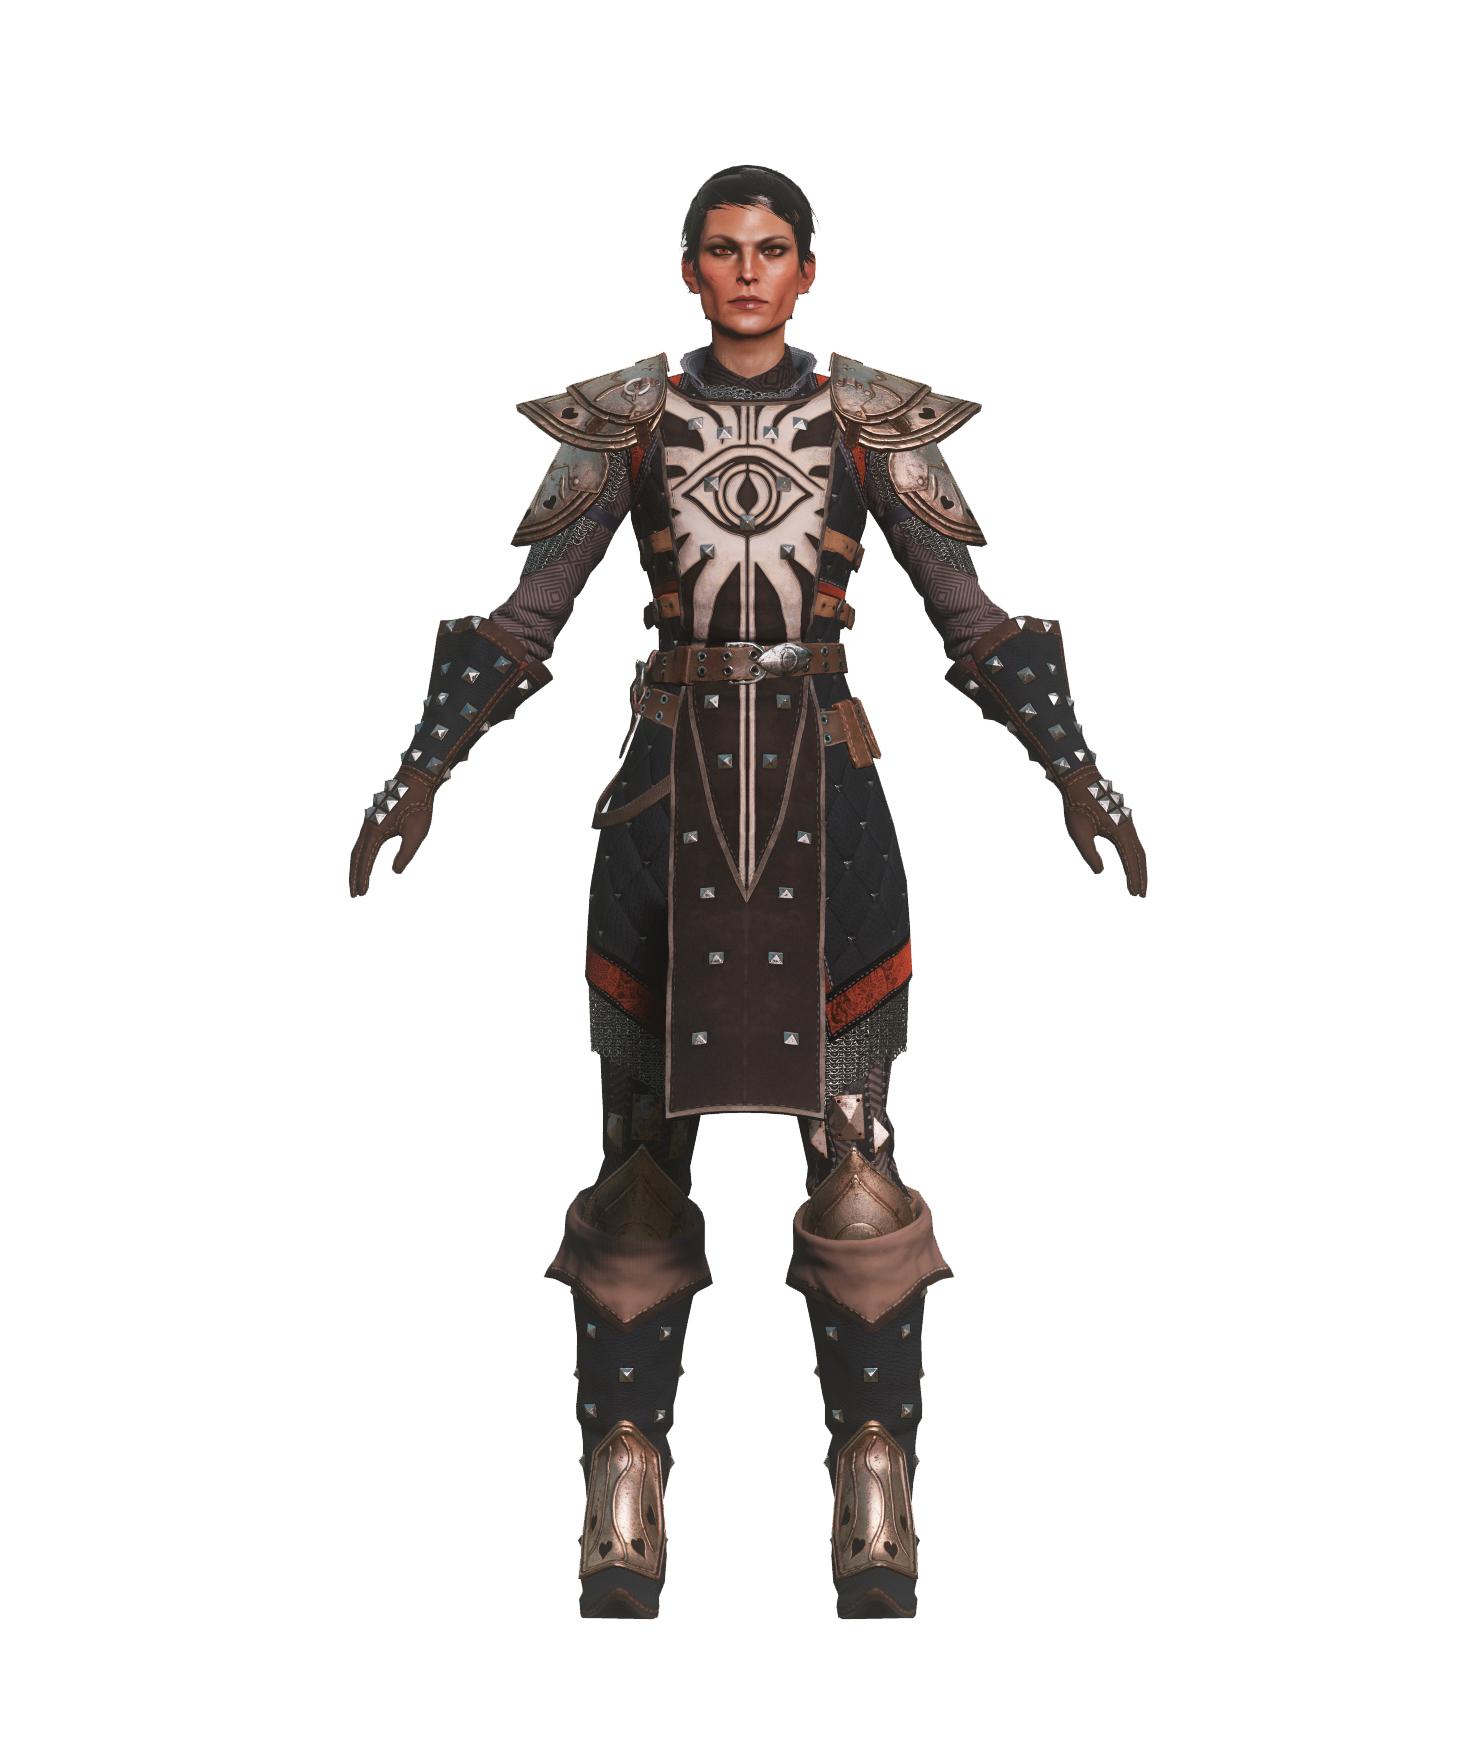 Dragon Age Inquisition Character Kits #2 – BioWare Blog